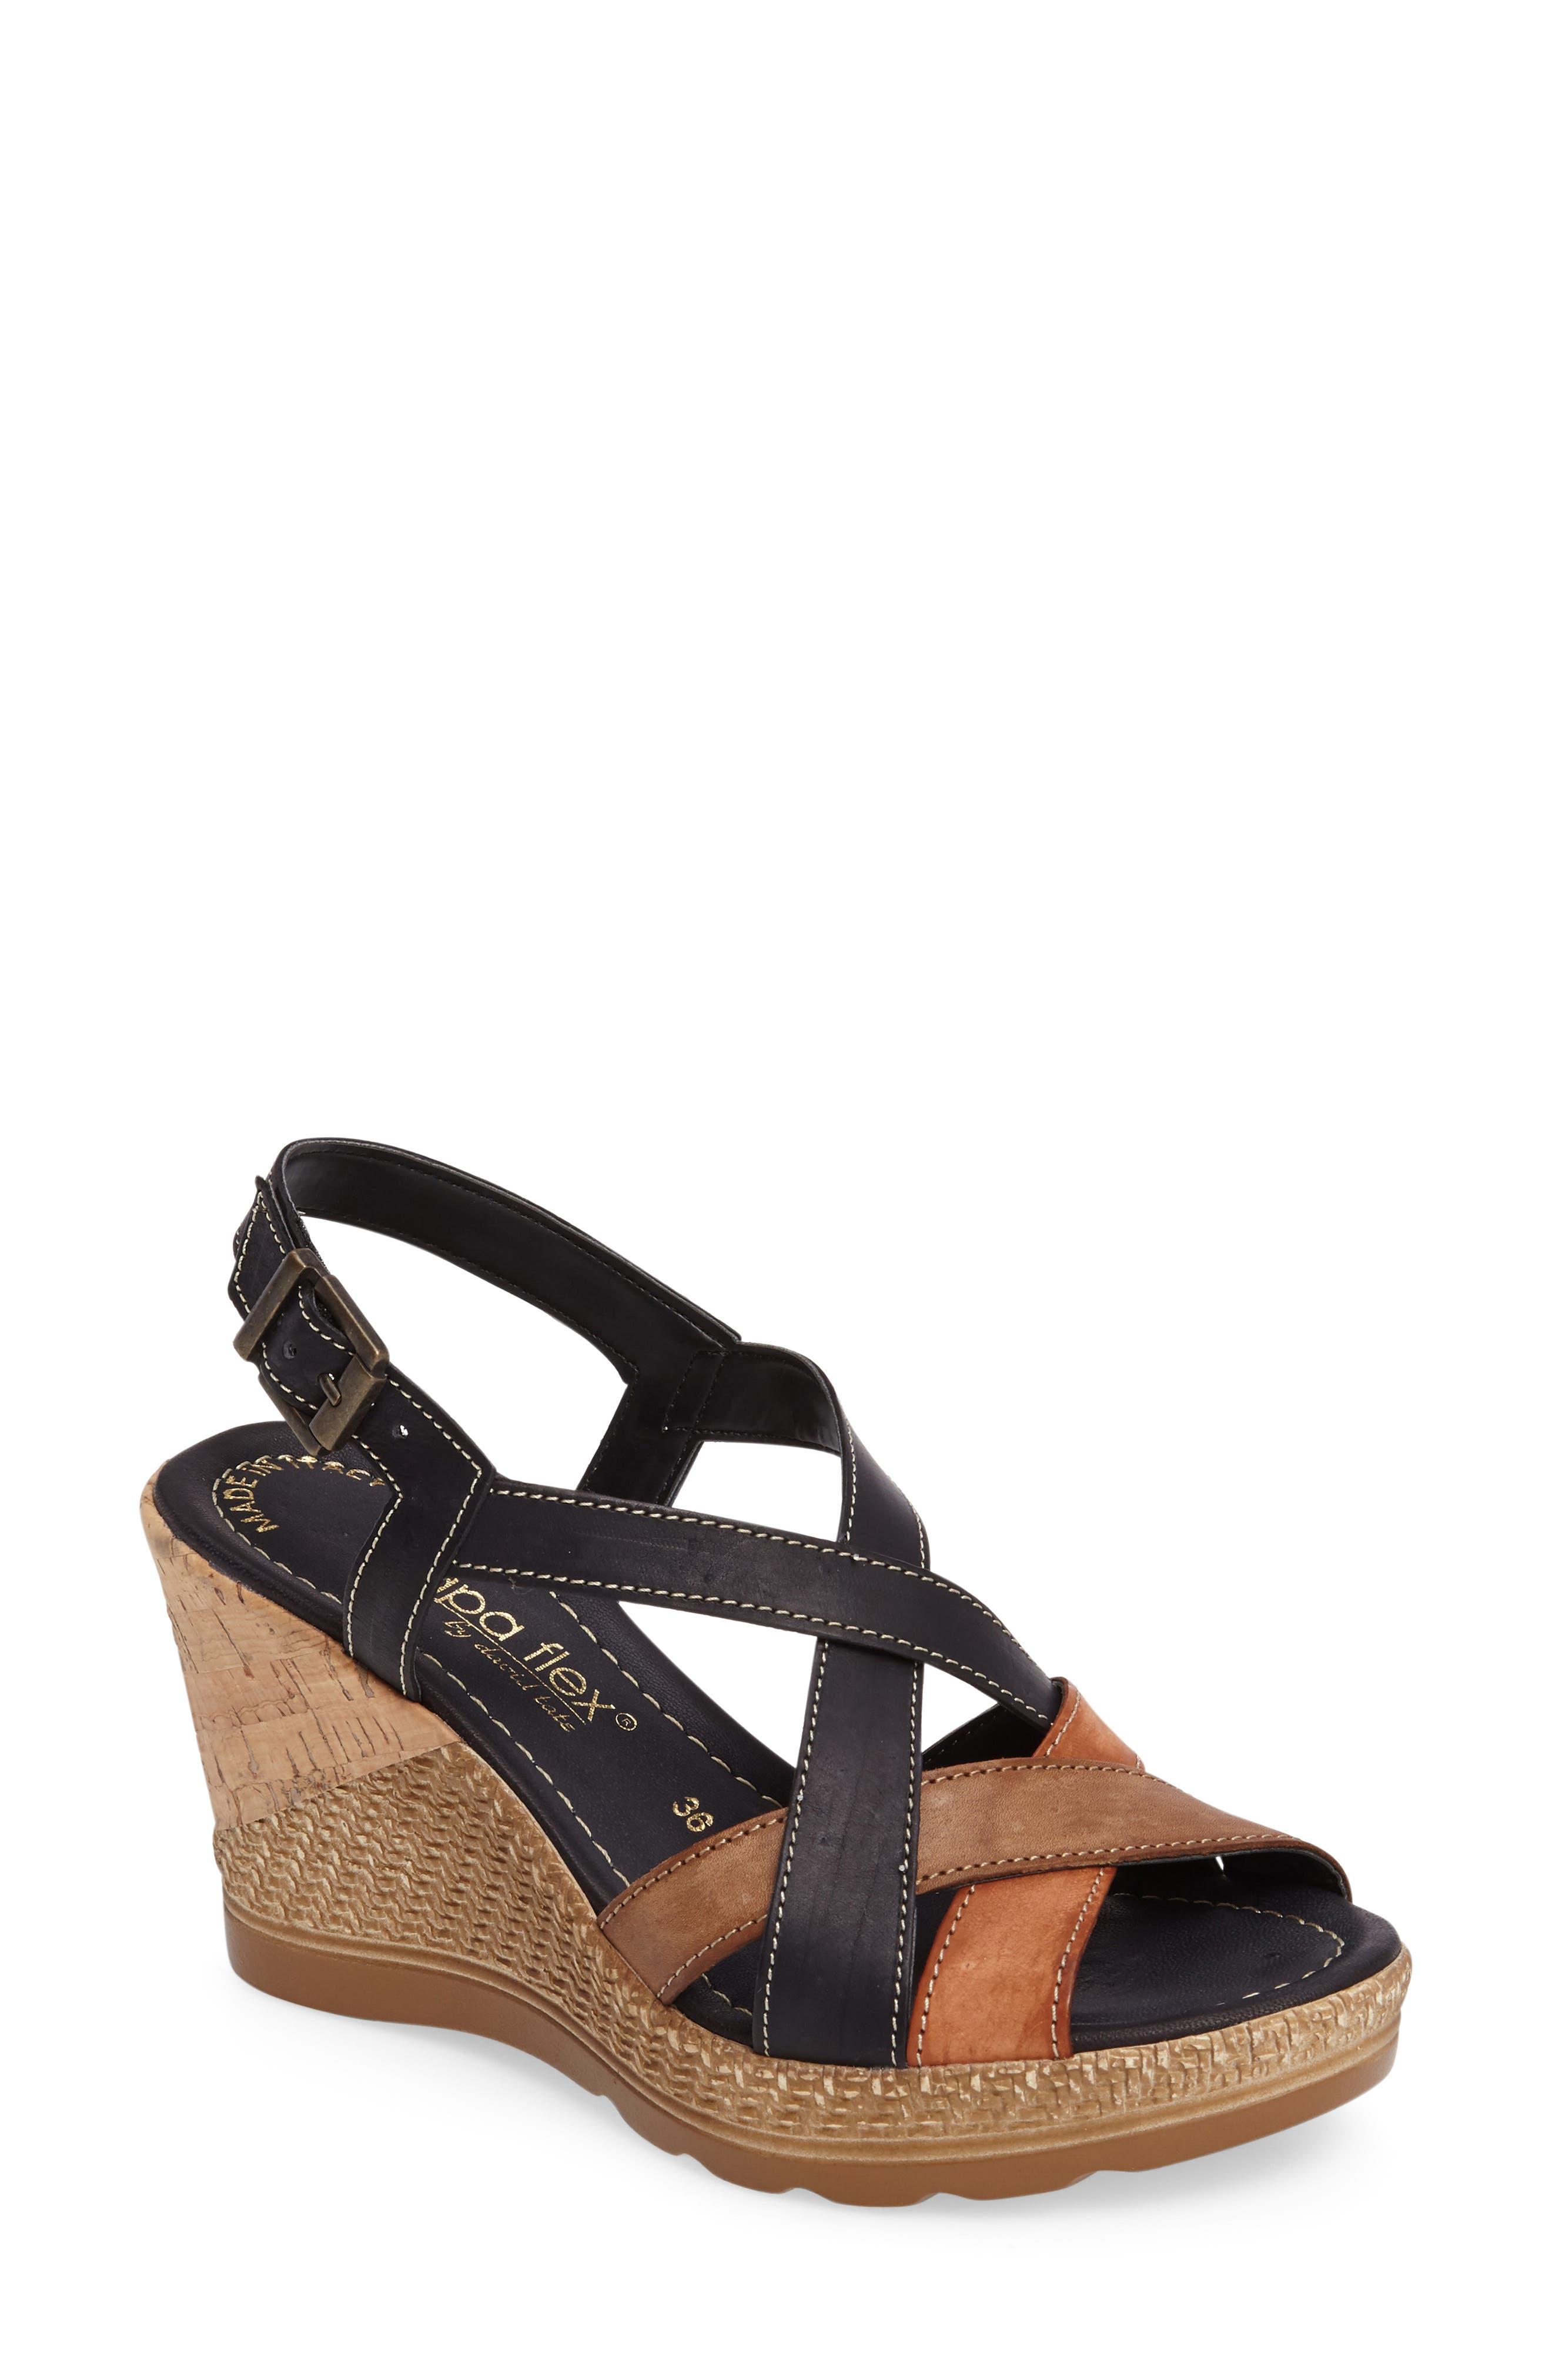 Modena Wedge Sandal,                             Main thumbnail 1, color,                             001